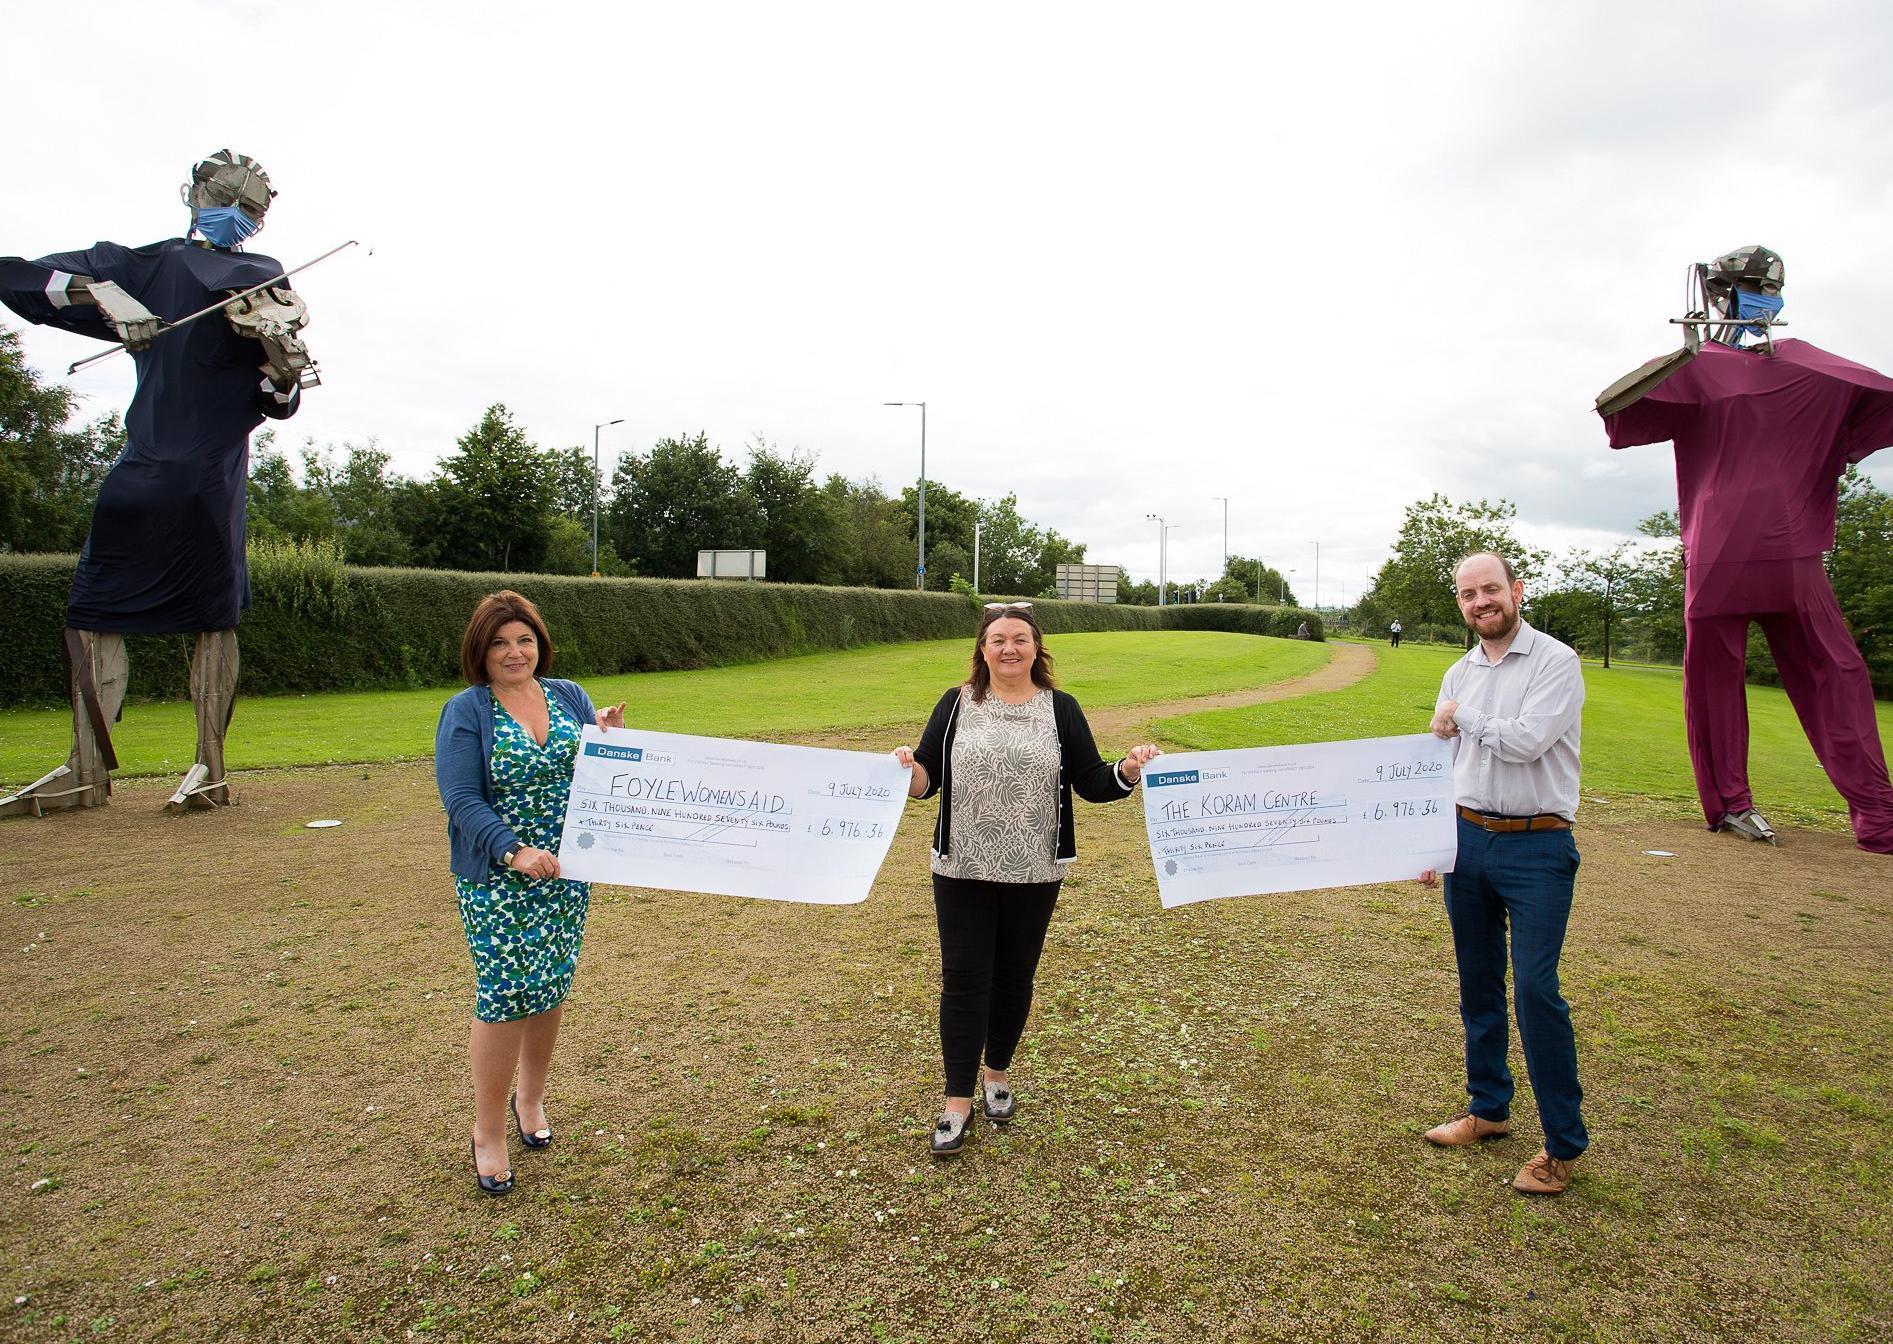 Former Mayor of Derry & Strabane Michaela Boyle raises almost £14,000 for local charities